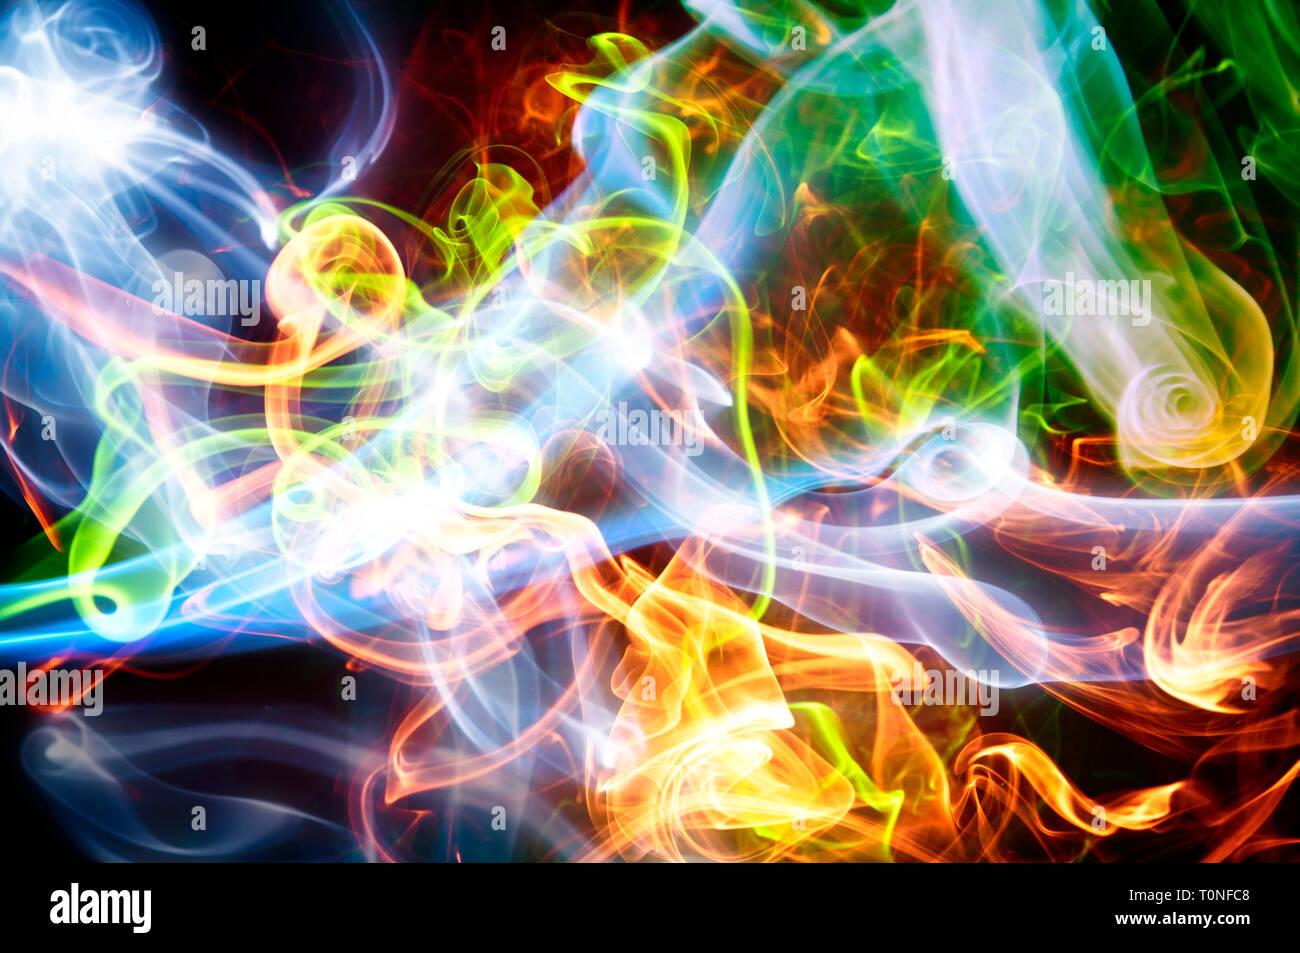 abstract colorful smoke swirls - Stock Image